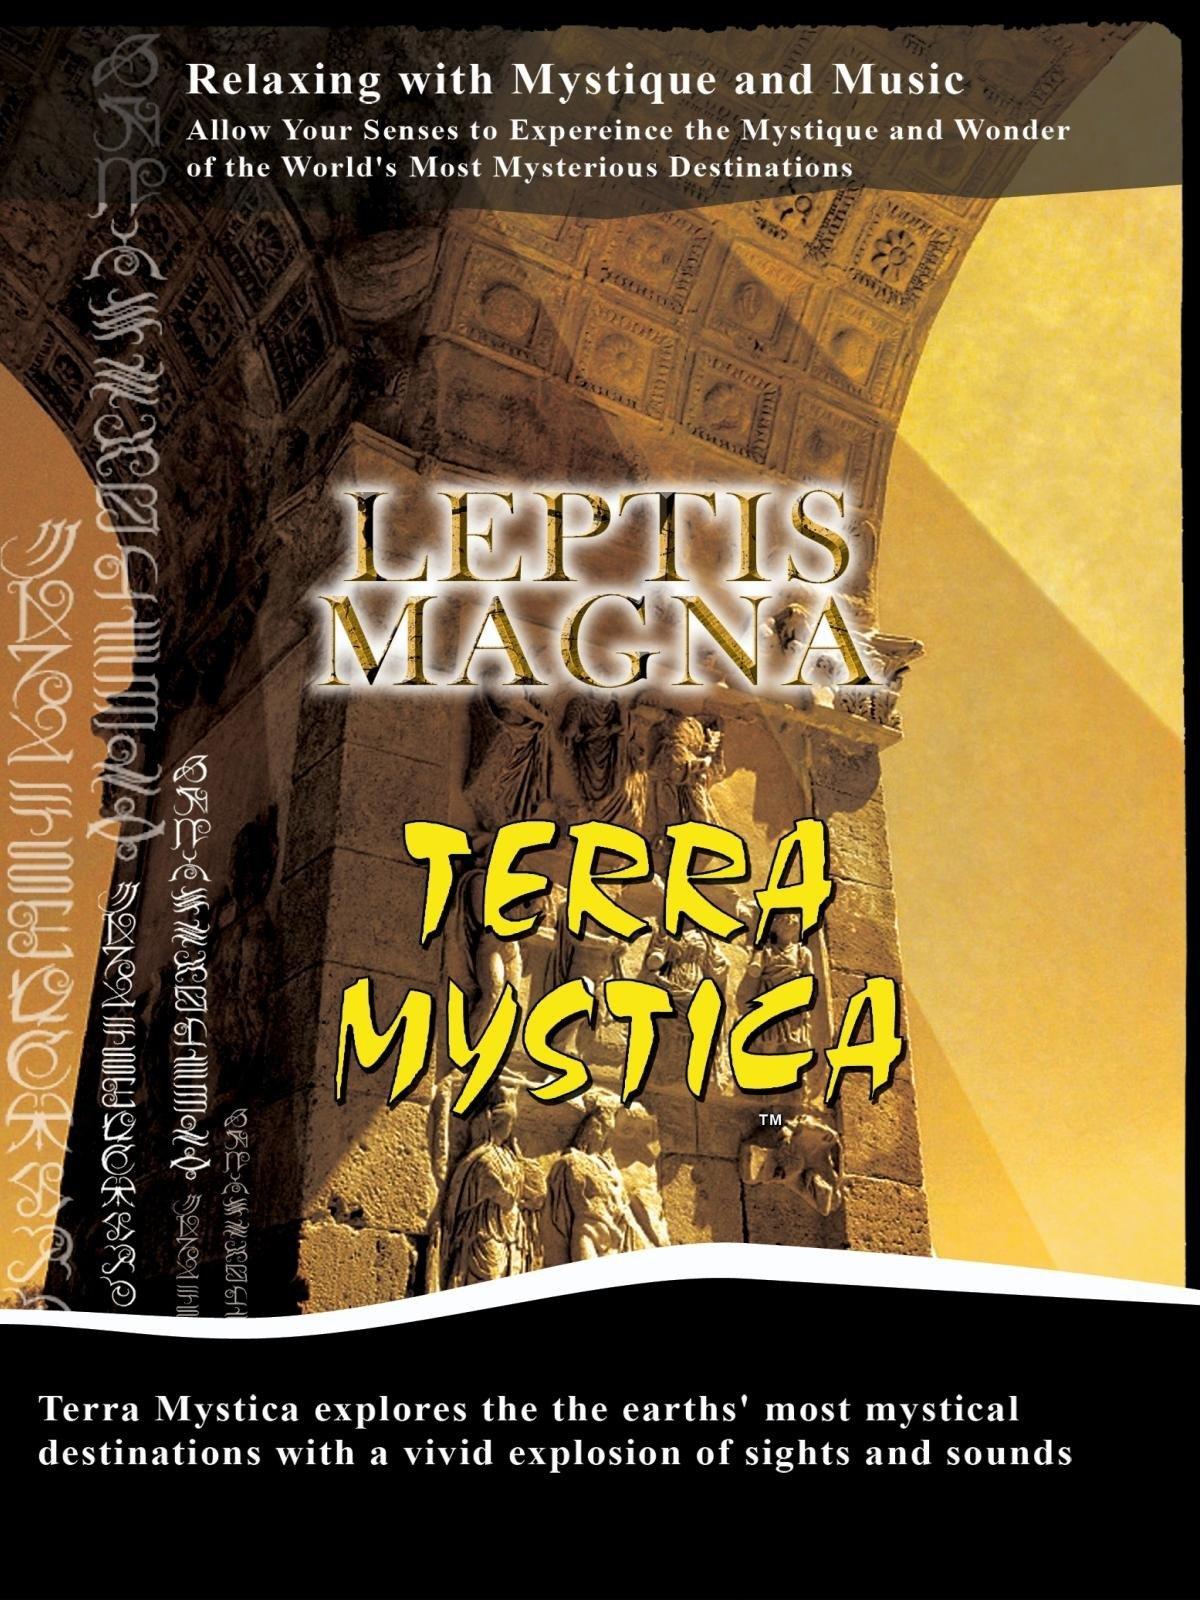 Terra Mystica - Leptis Magna on Amazon Prime Video UK